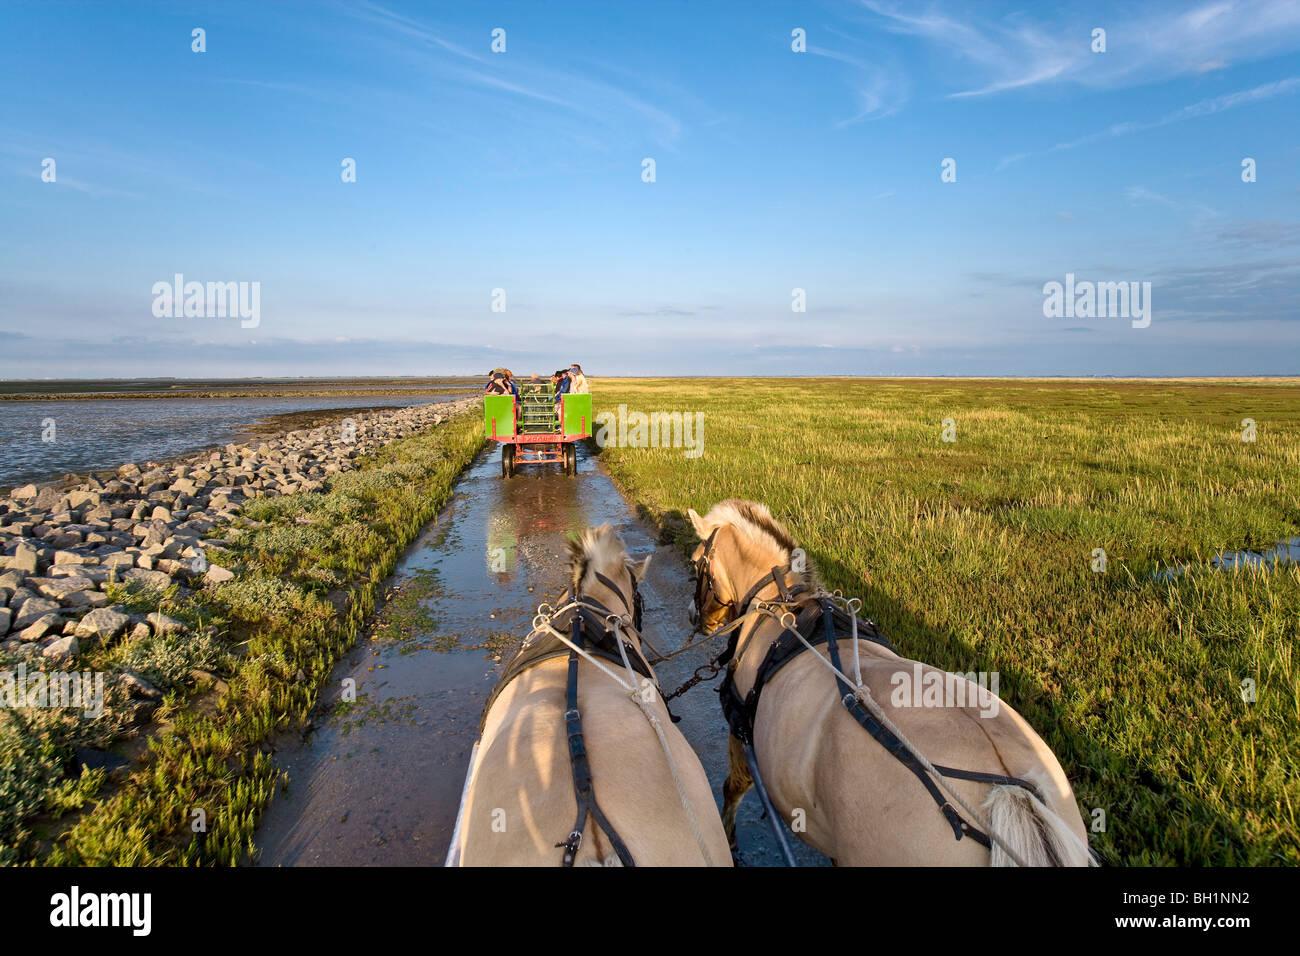 Horse Carriage Tour to Hallig Suedfall, North Frisian Islands, Schleswig-Holstein, Germany - Stock Image